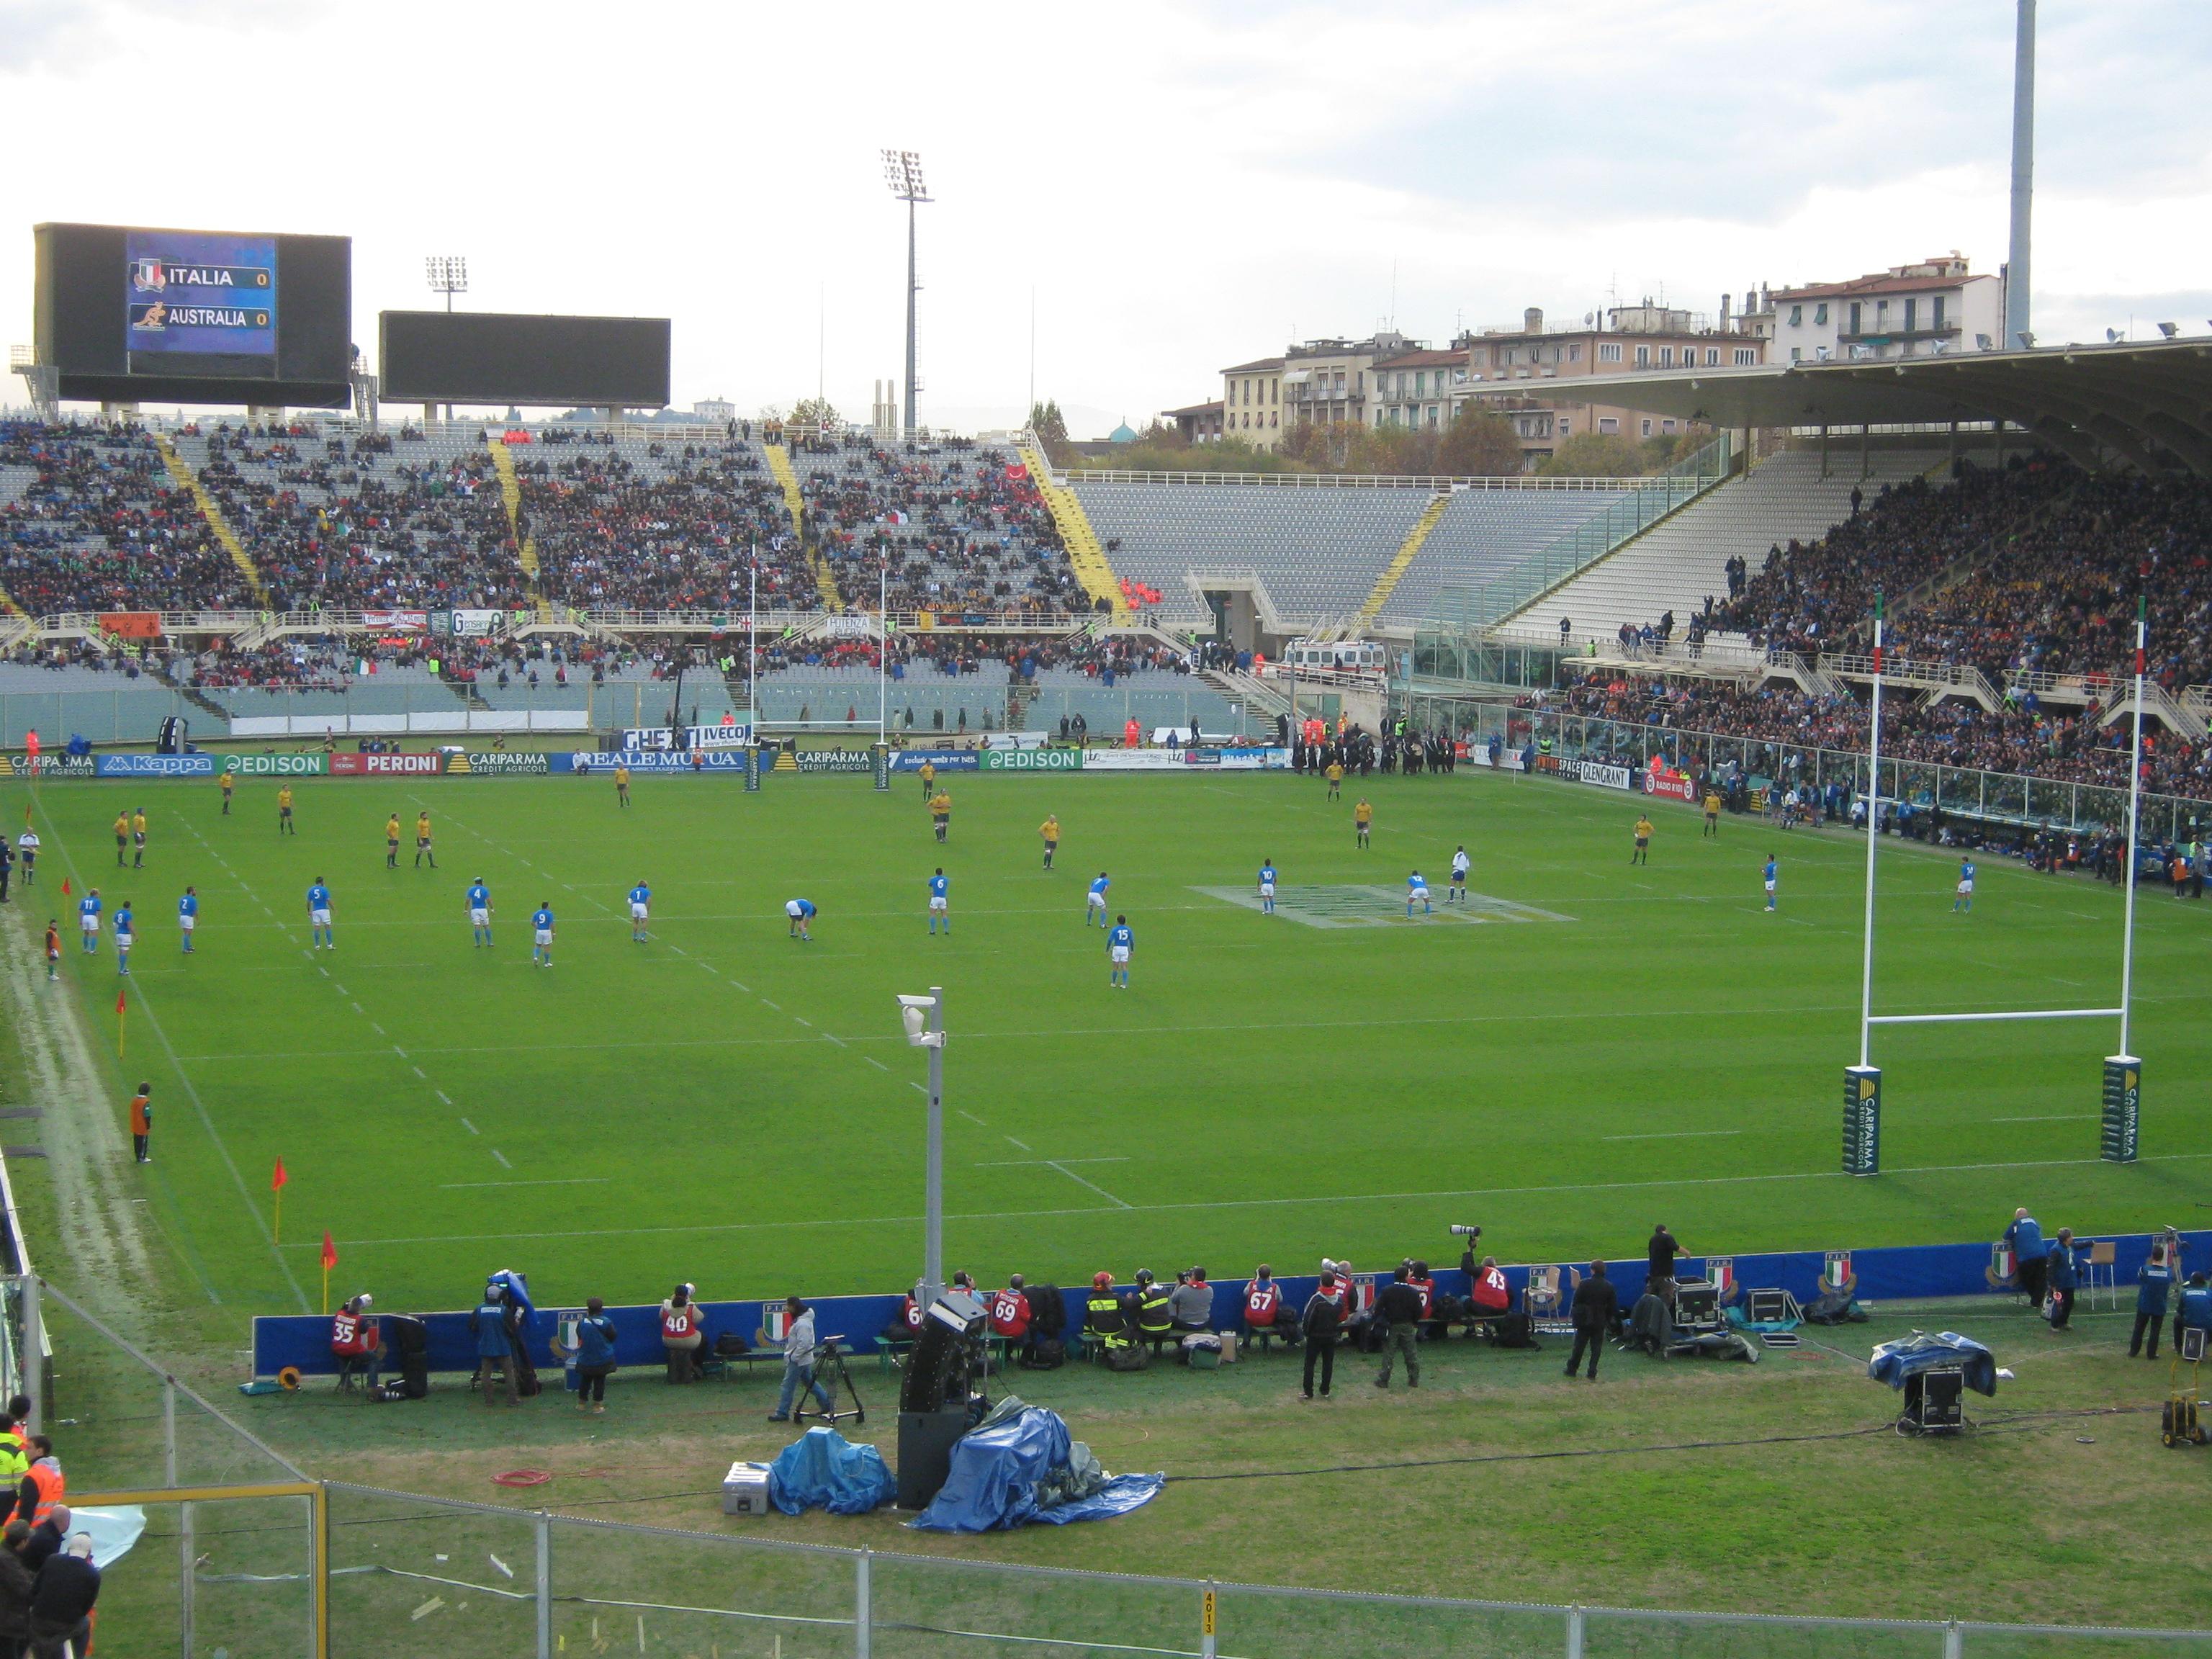 Stadio Artemio Franchi Stadio artemio franchi -